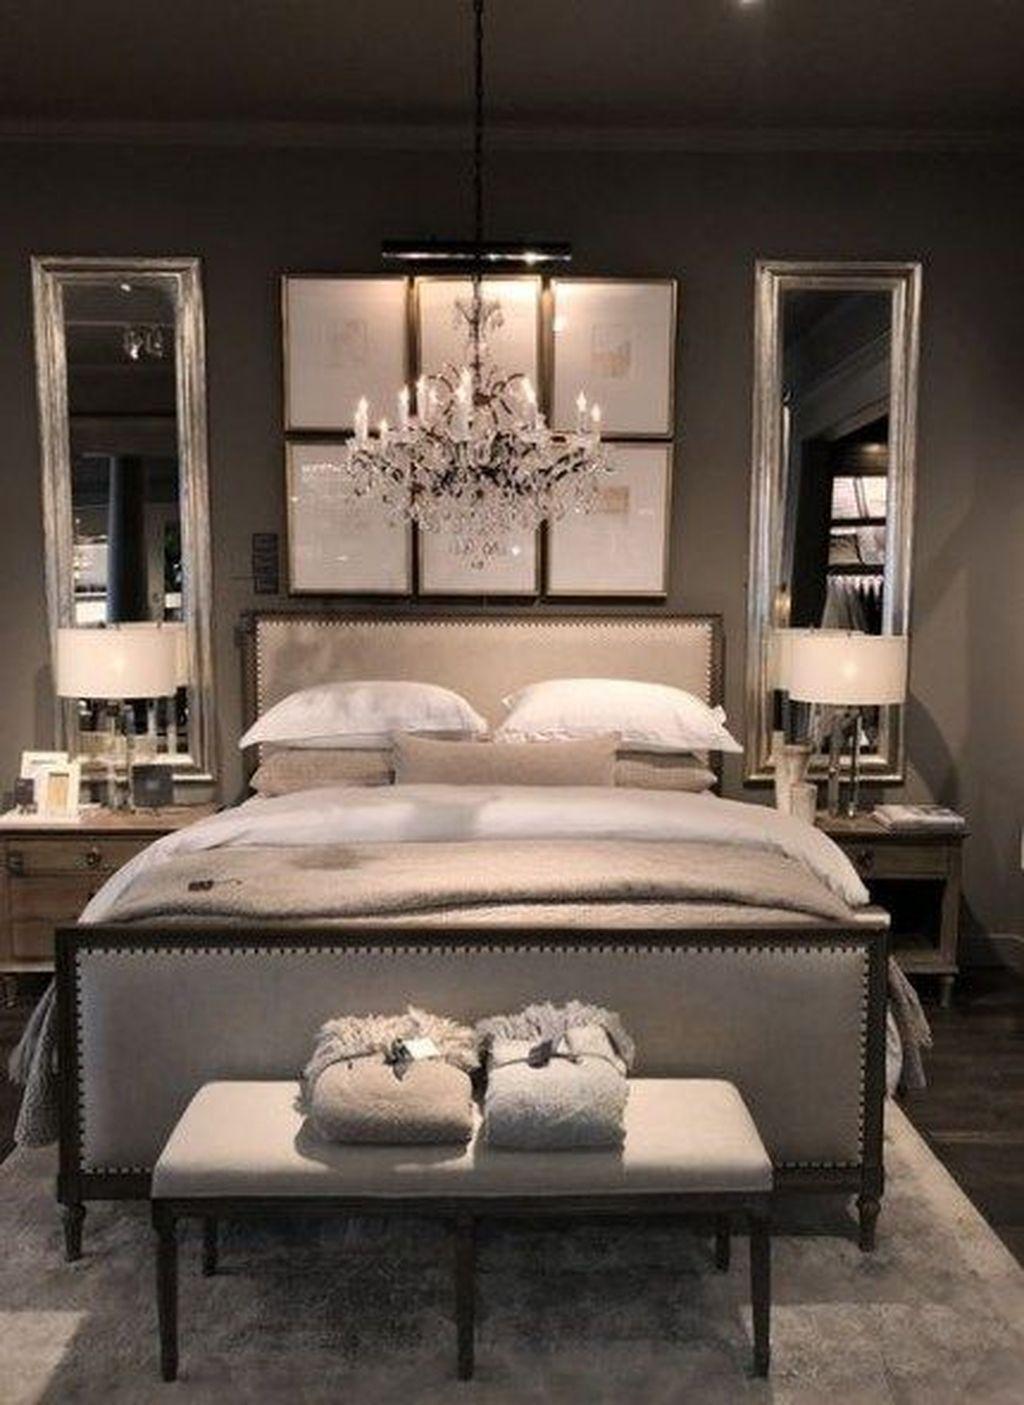 46 Inexpensive Master Bedroom Remodel Ideas For You Cluedecor Restoration Hardware Bedroom Luxury Bedroom Design Master Bedrooms Decor